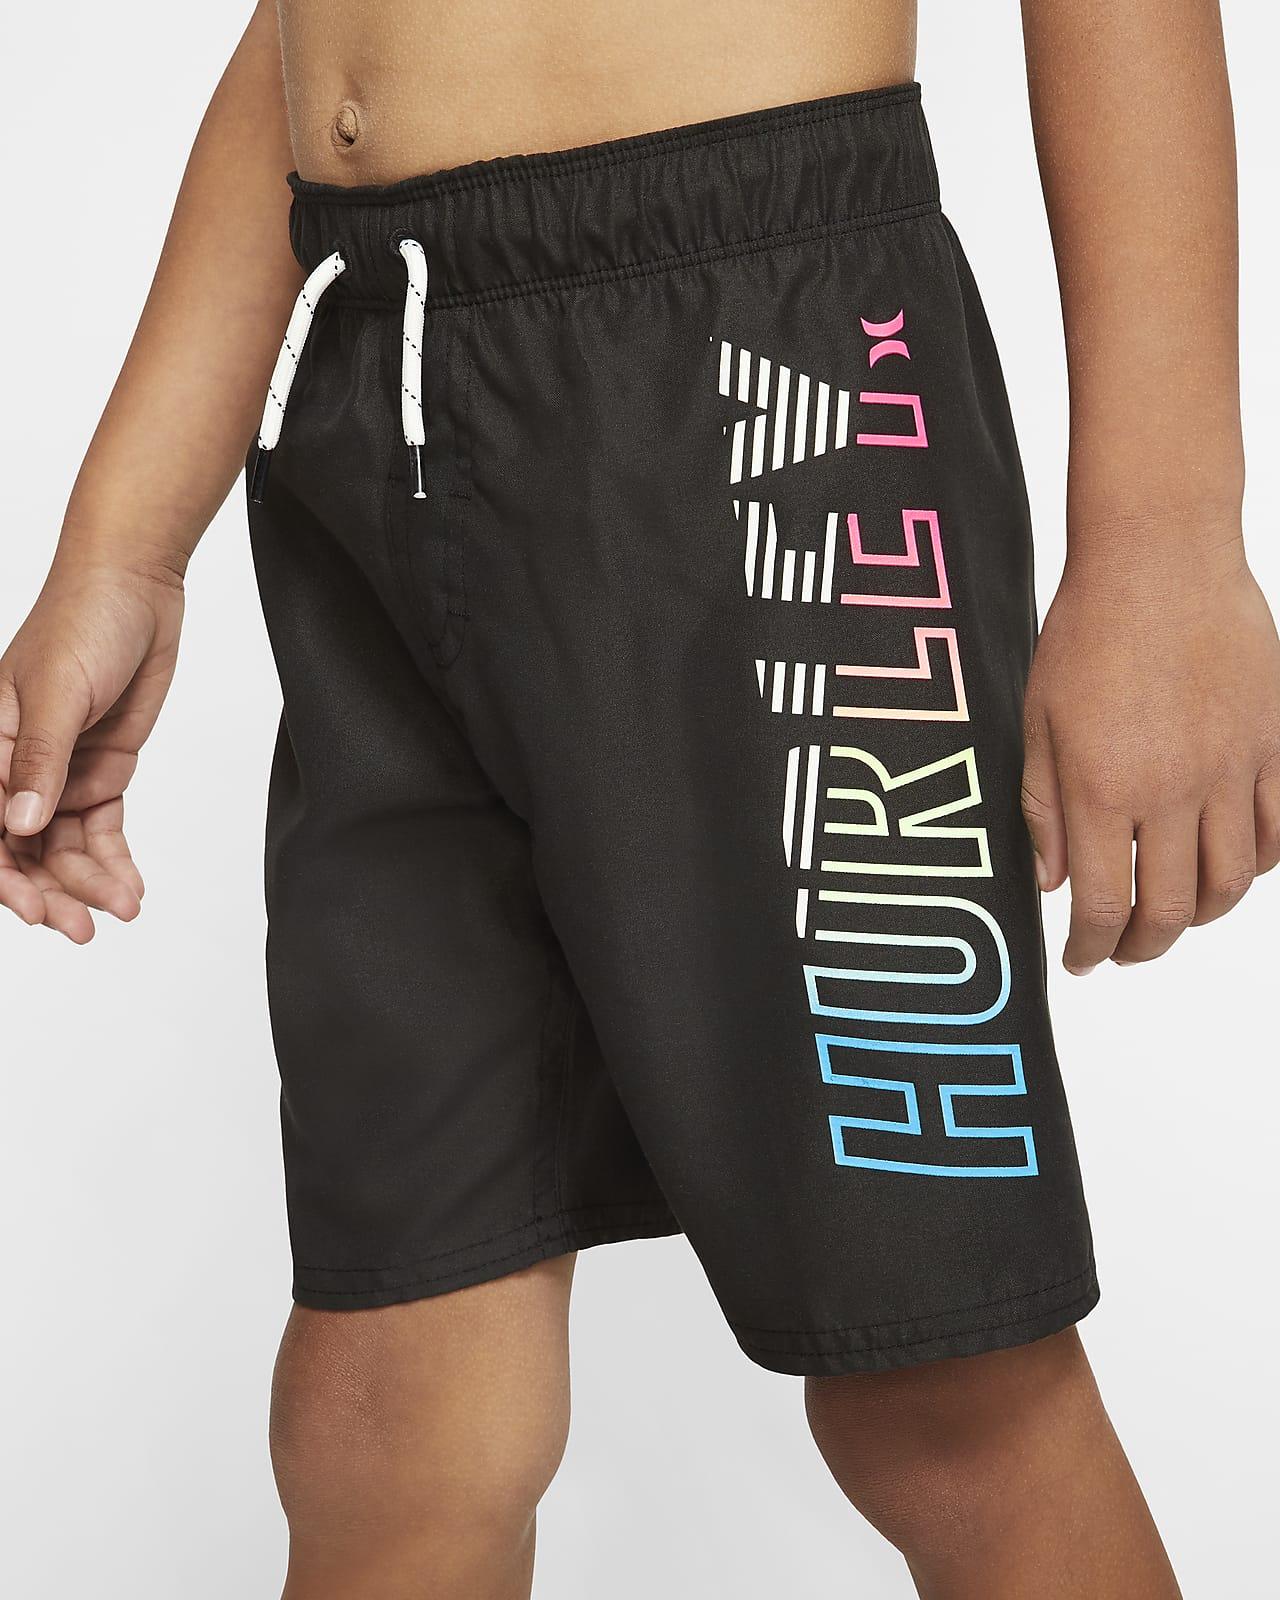 Hurley Onshore Boys' Pull-On Board Shorts